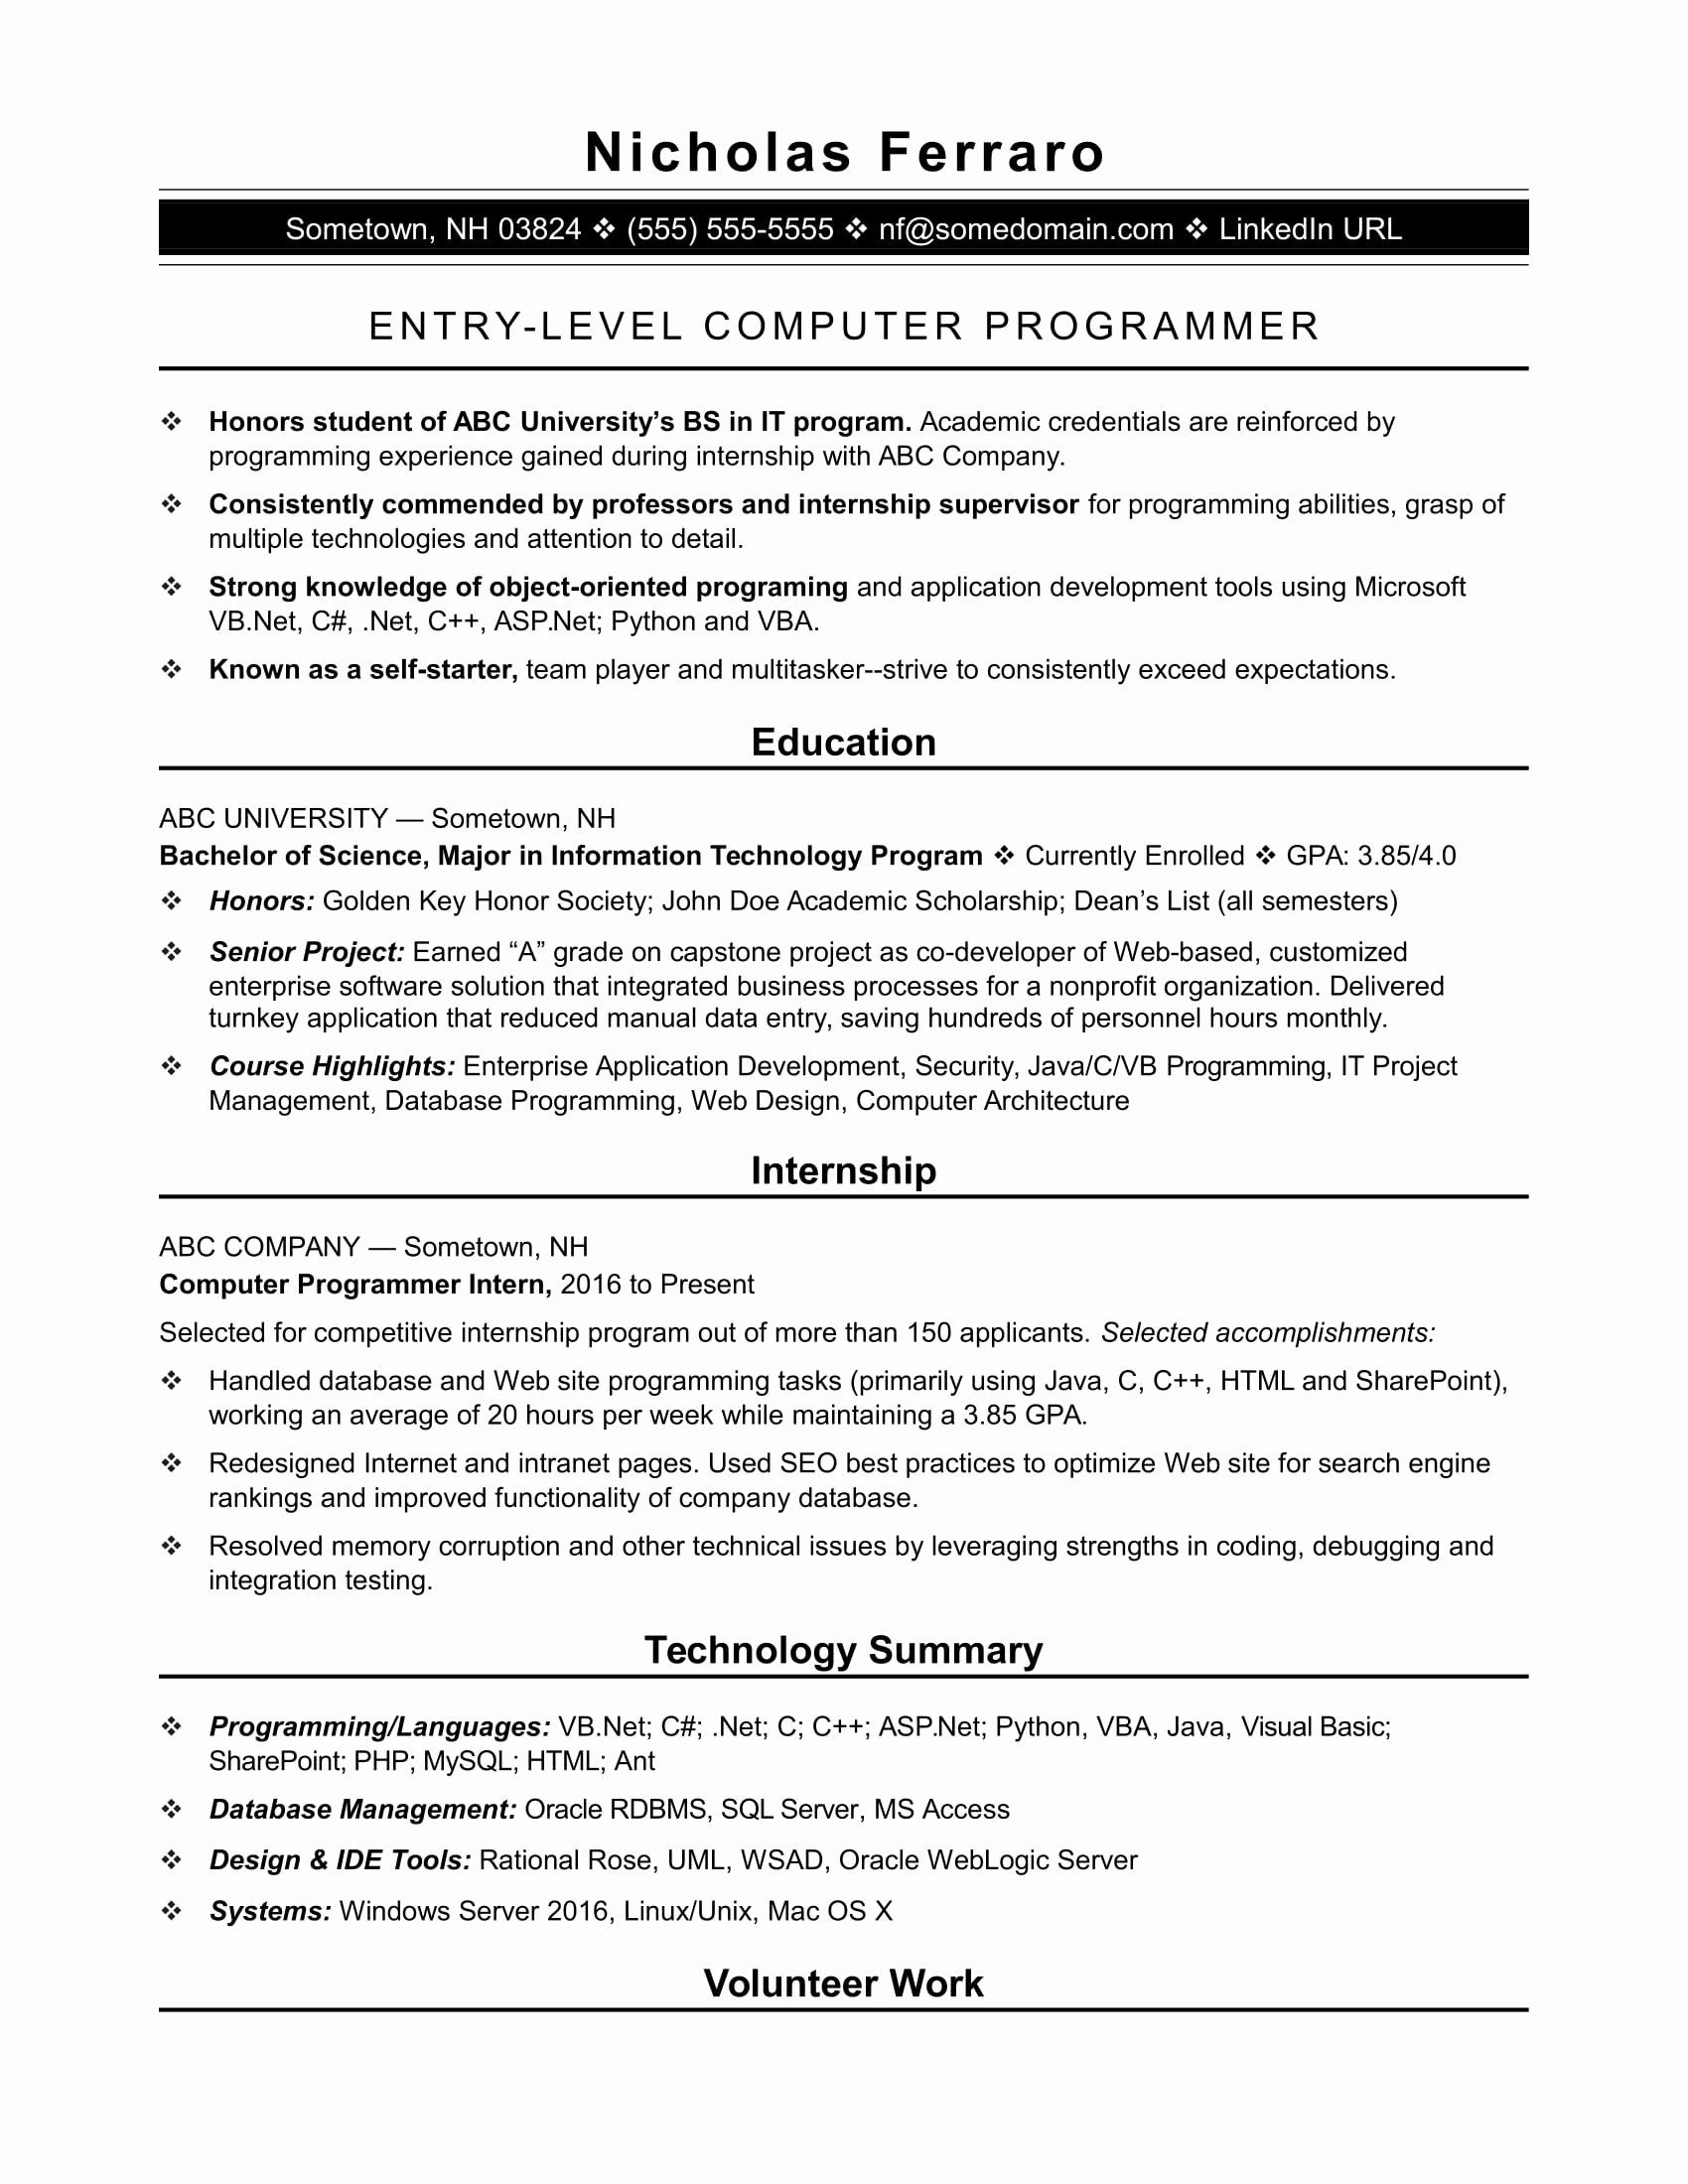 Computer science internship resume beautiful 12 13